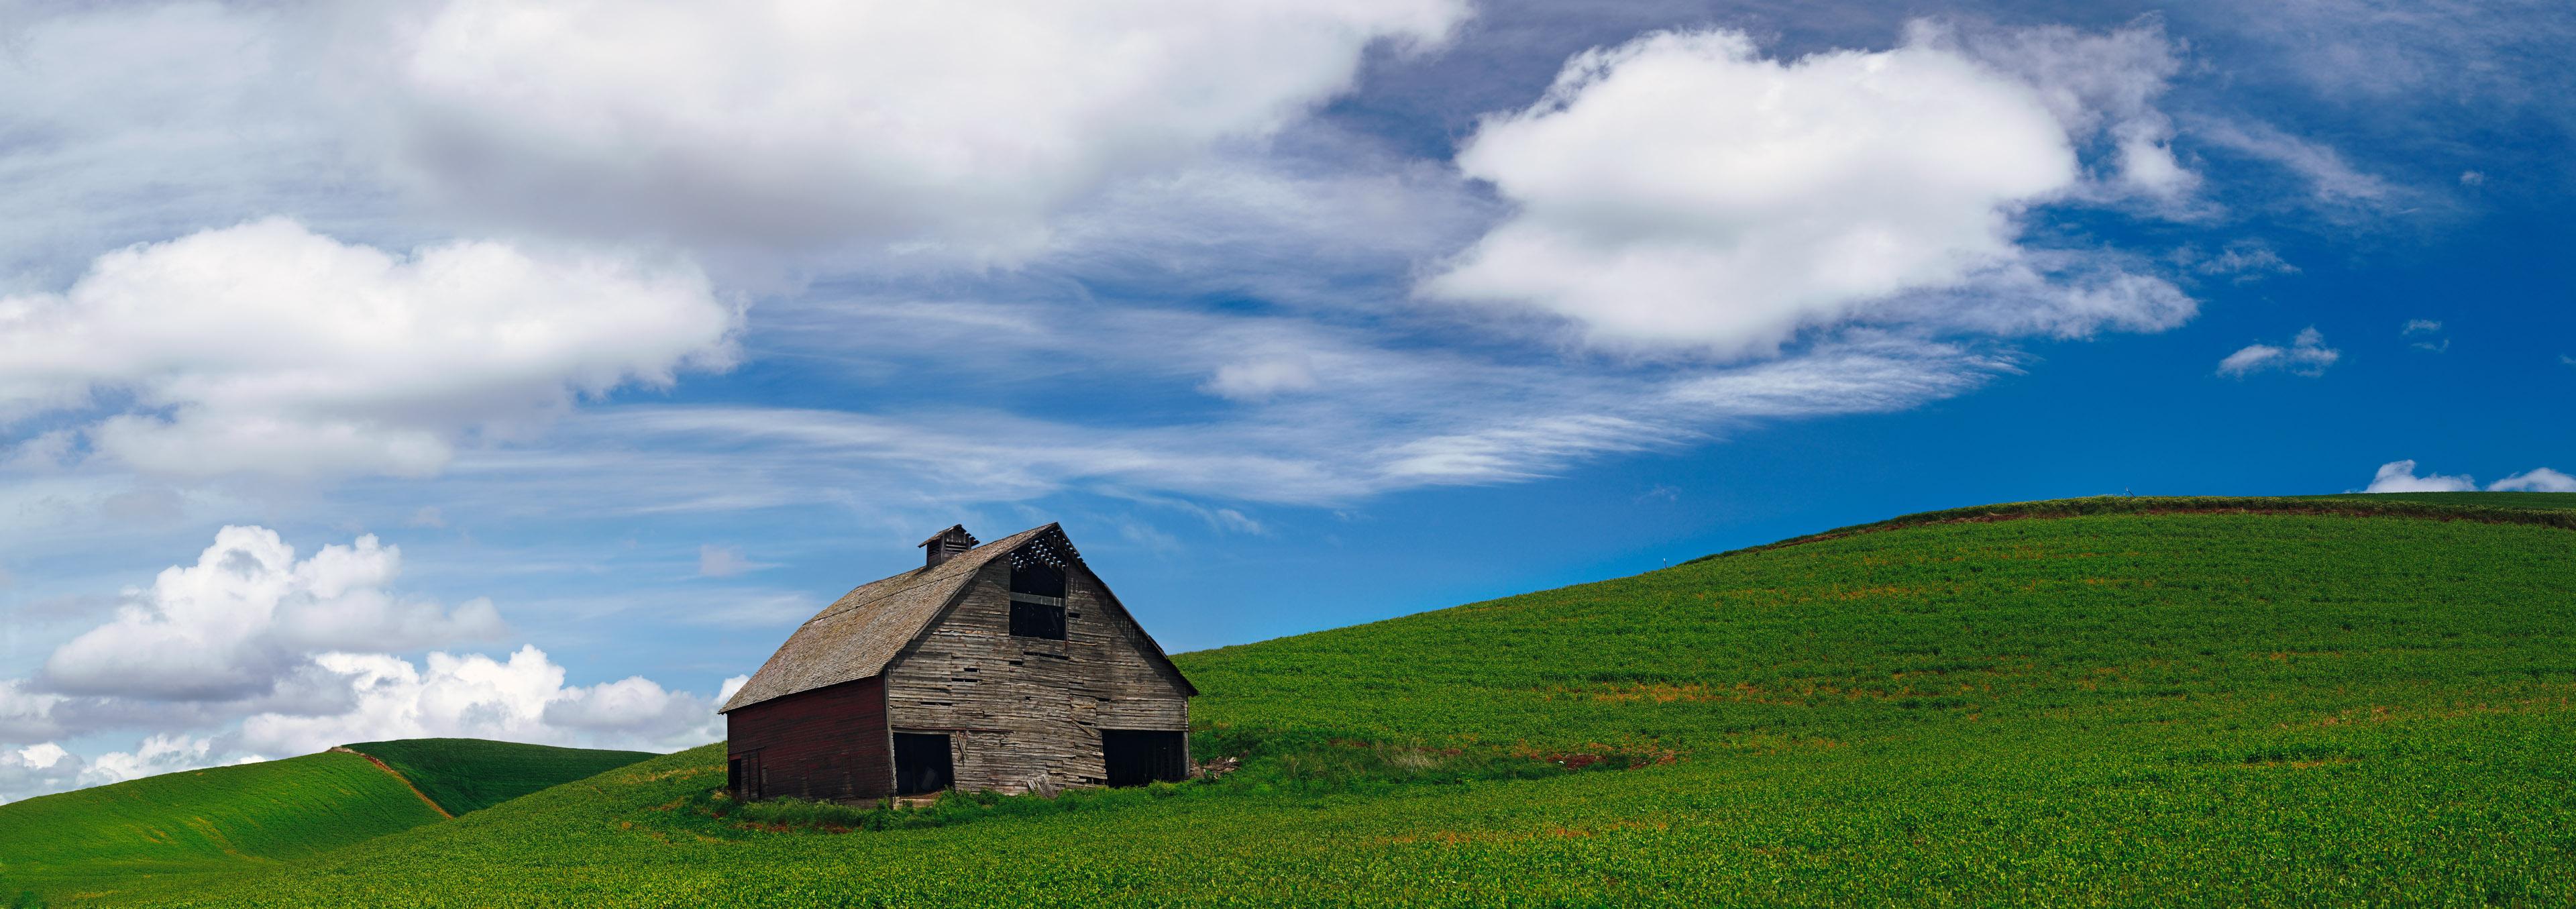 Gil's Barn, Palouse region of Southeast Washington